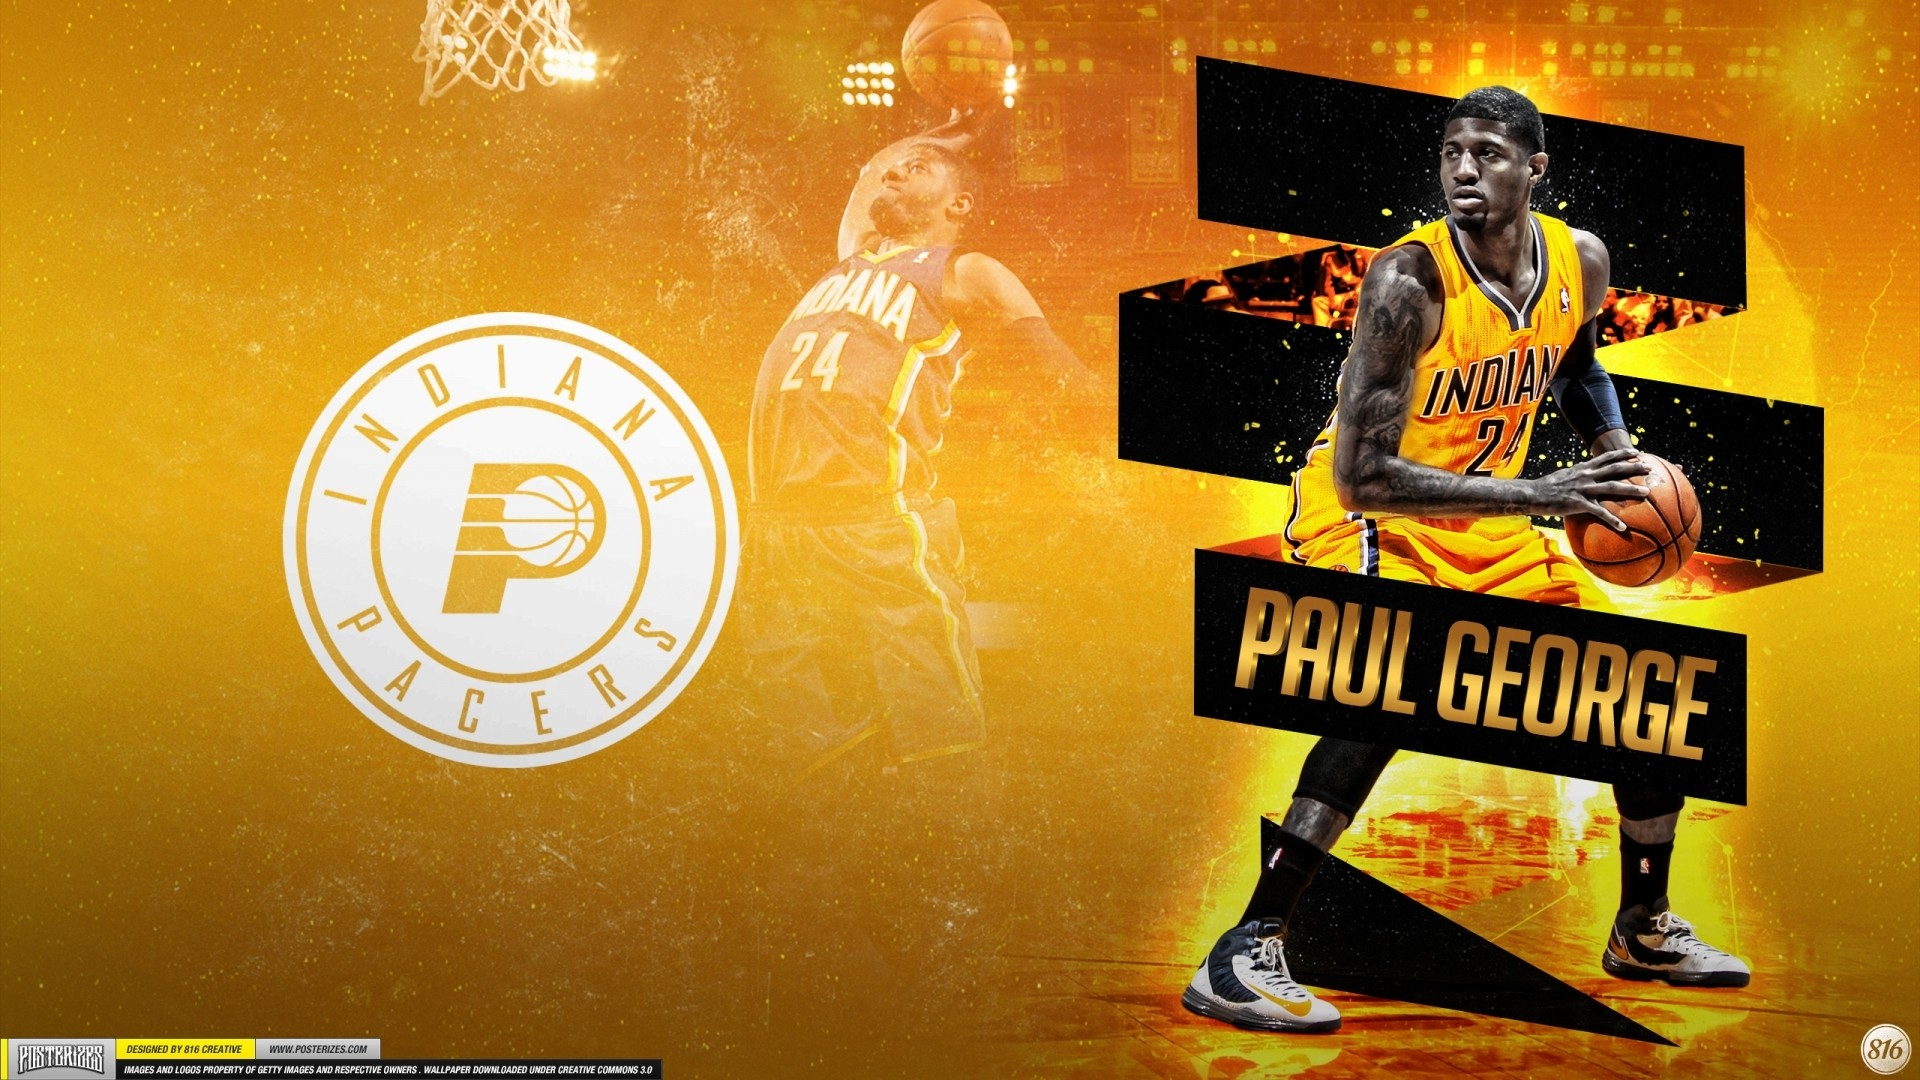 Paul George hd desktop wallpaper